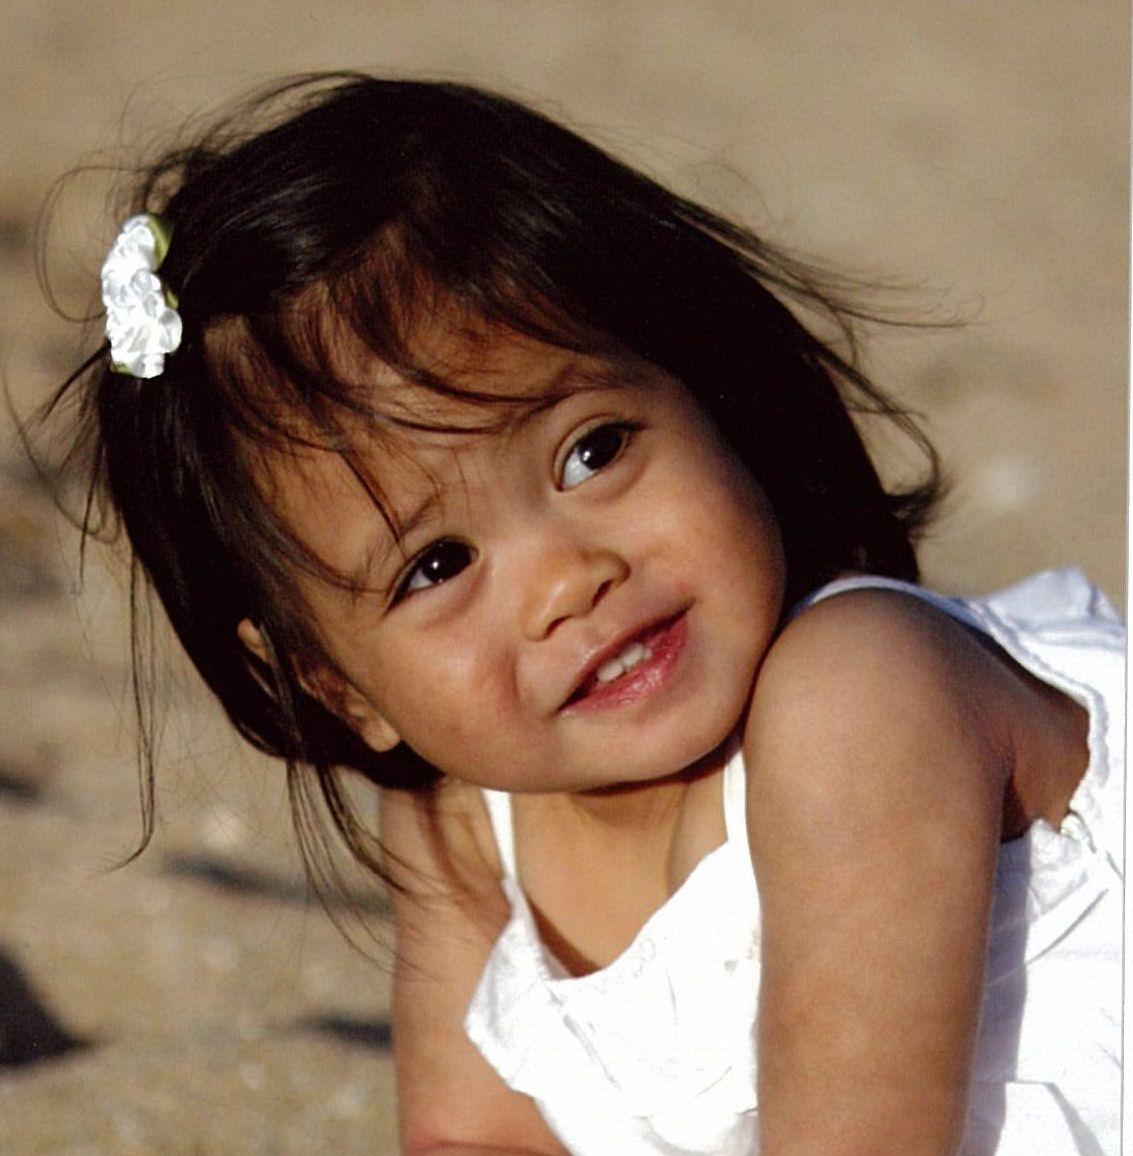 filipino kids - photo #42